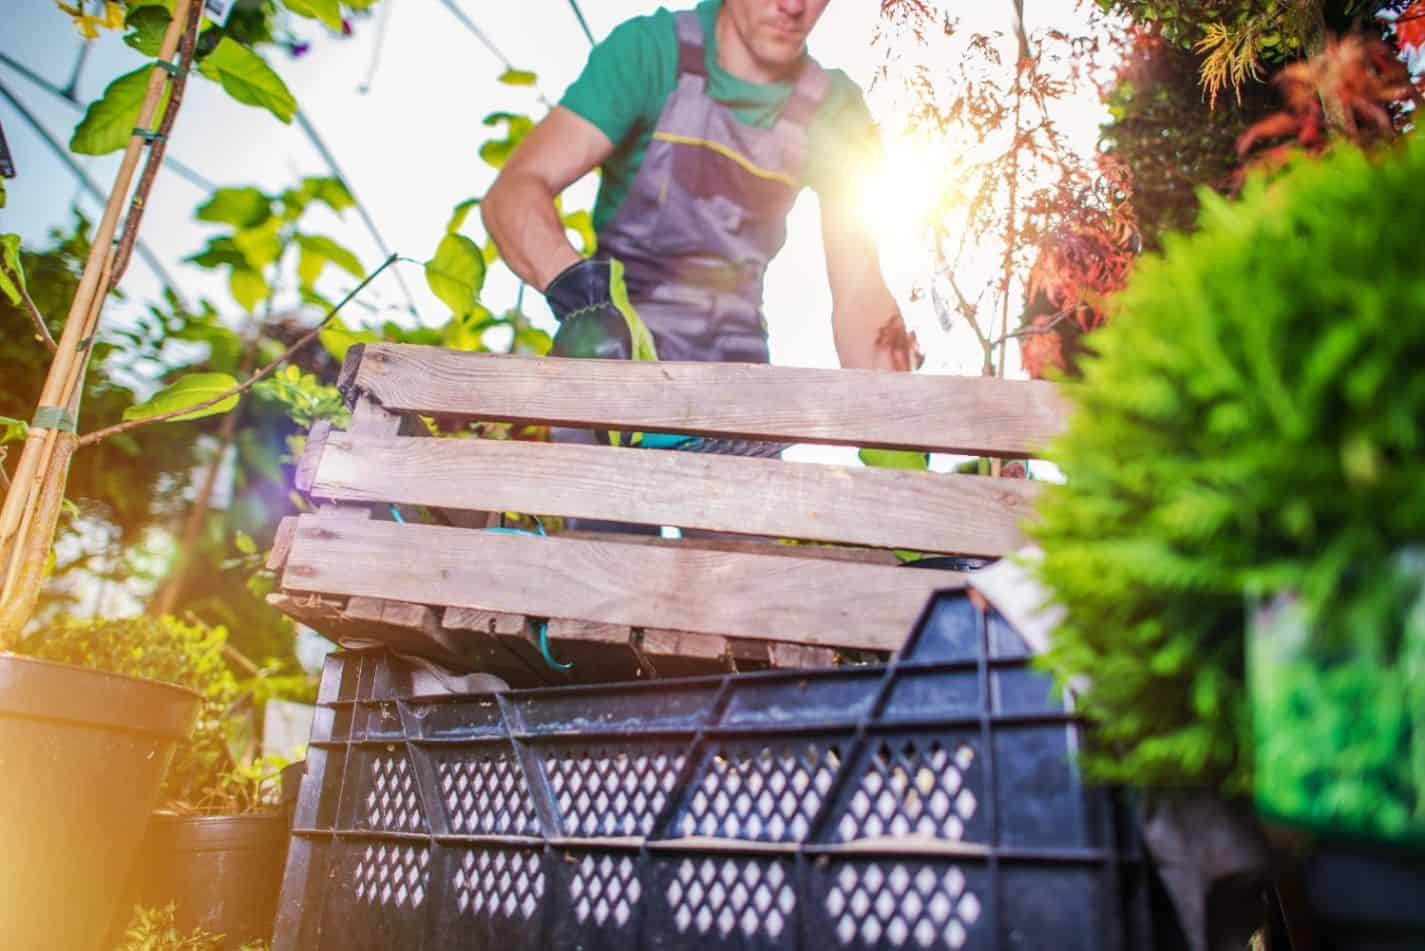 garden-staycation-ideas-1-prepare-your-space-freepik